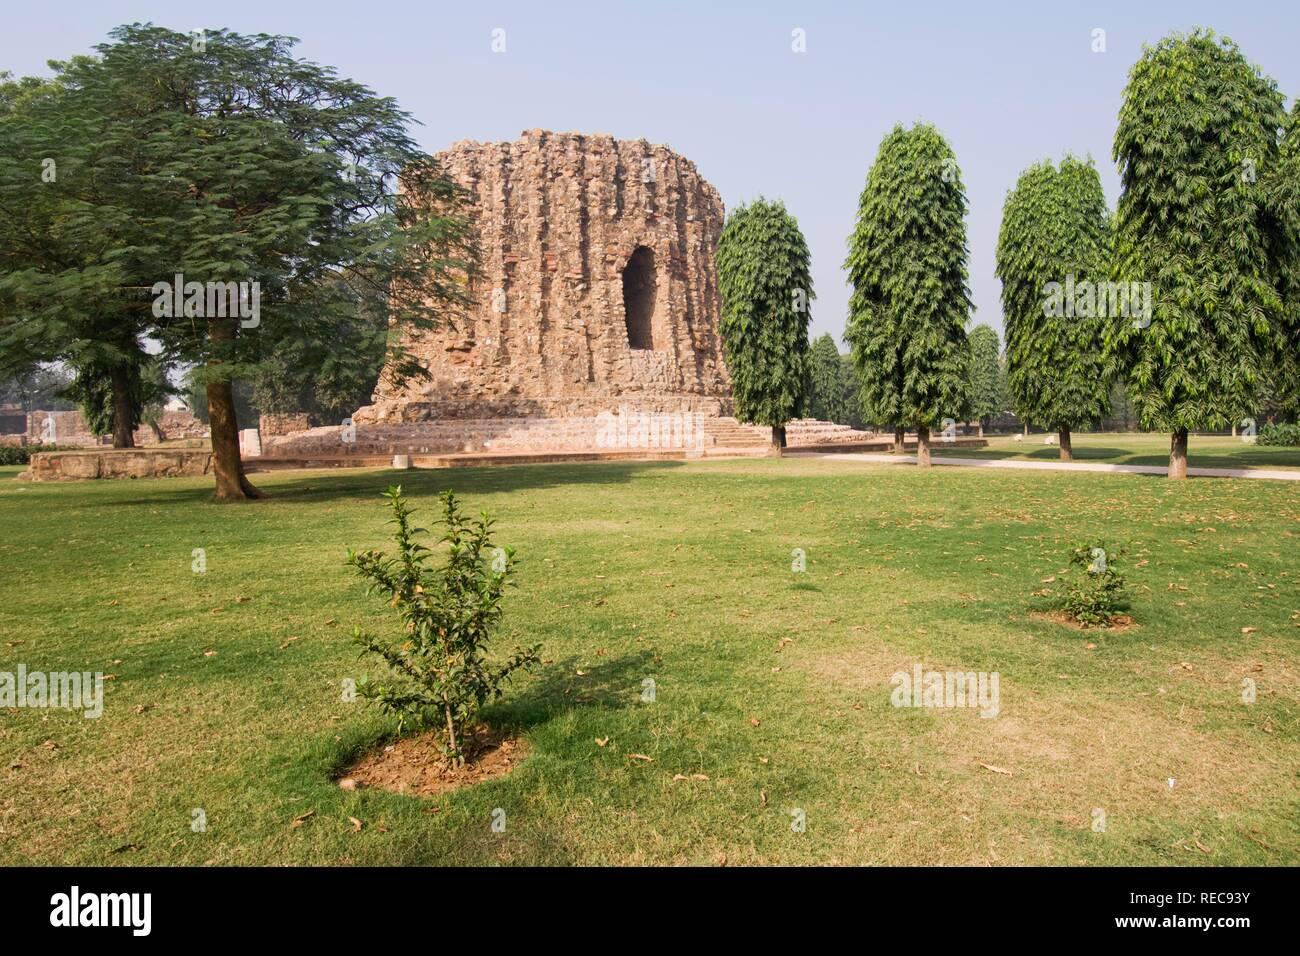 Incomplete minaret, Alai Minar, Unesco World Heritage Site, Mehrauli Archaeological Park, Delhi, India - Stock Image